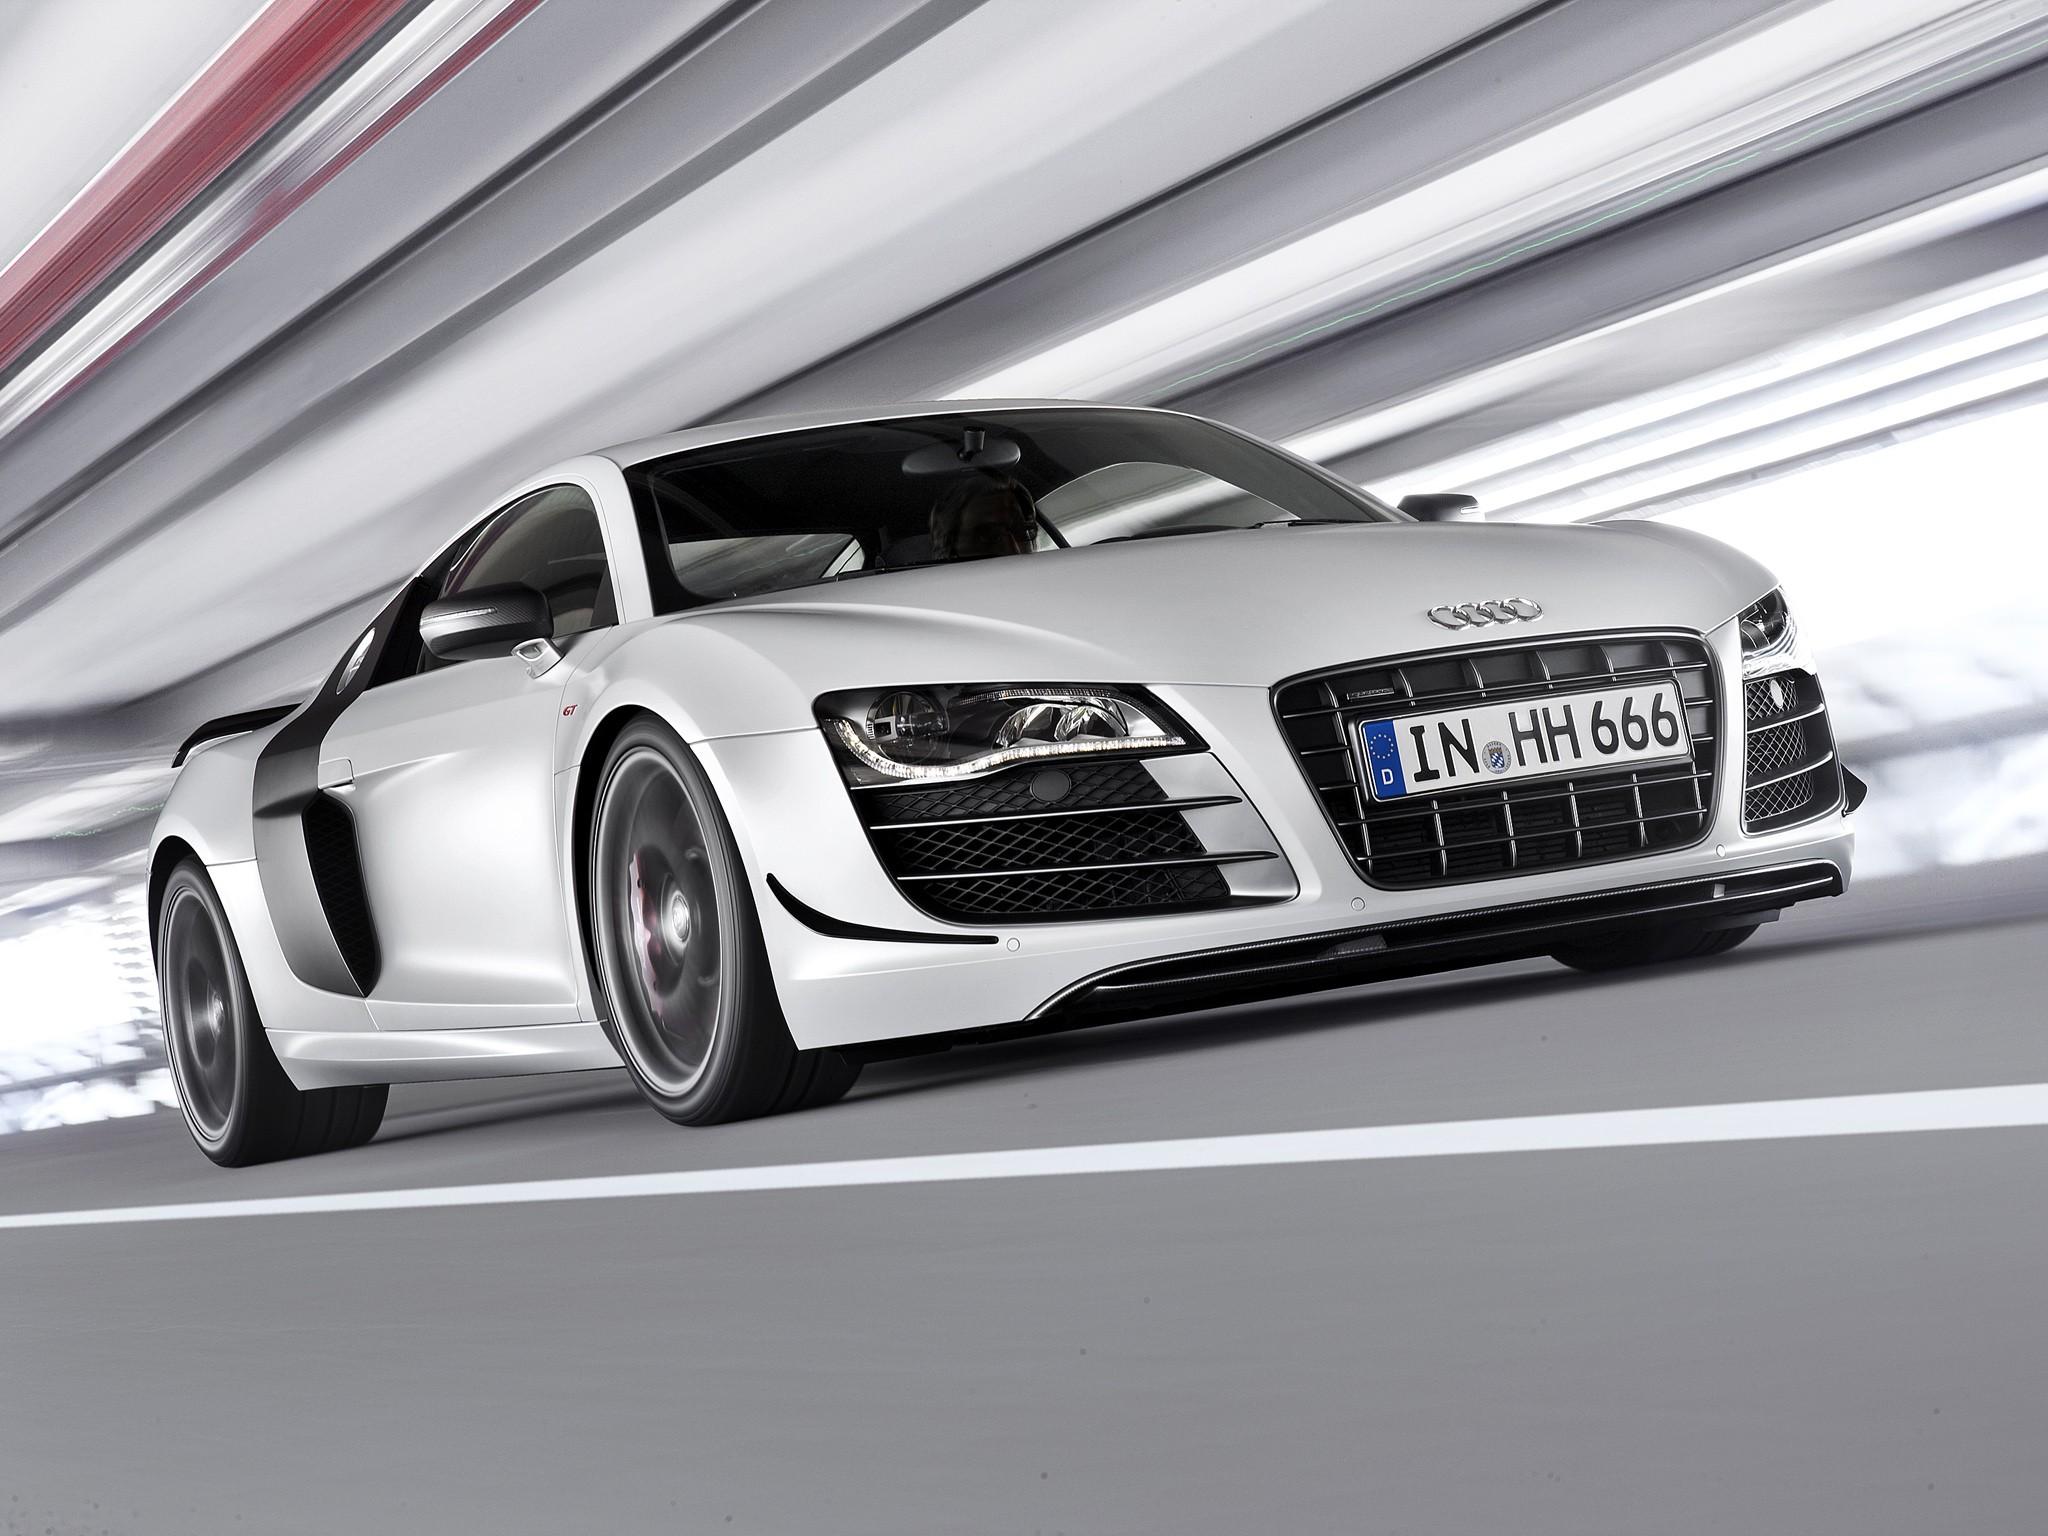 Audi R8 Gt Specs Amp Photos 2010 2011 2012 2013